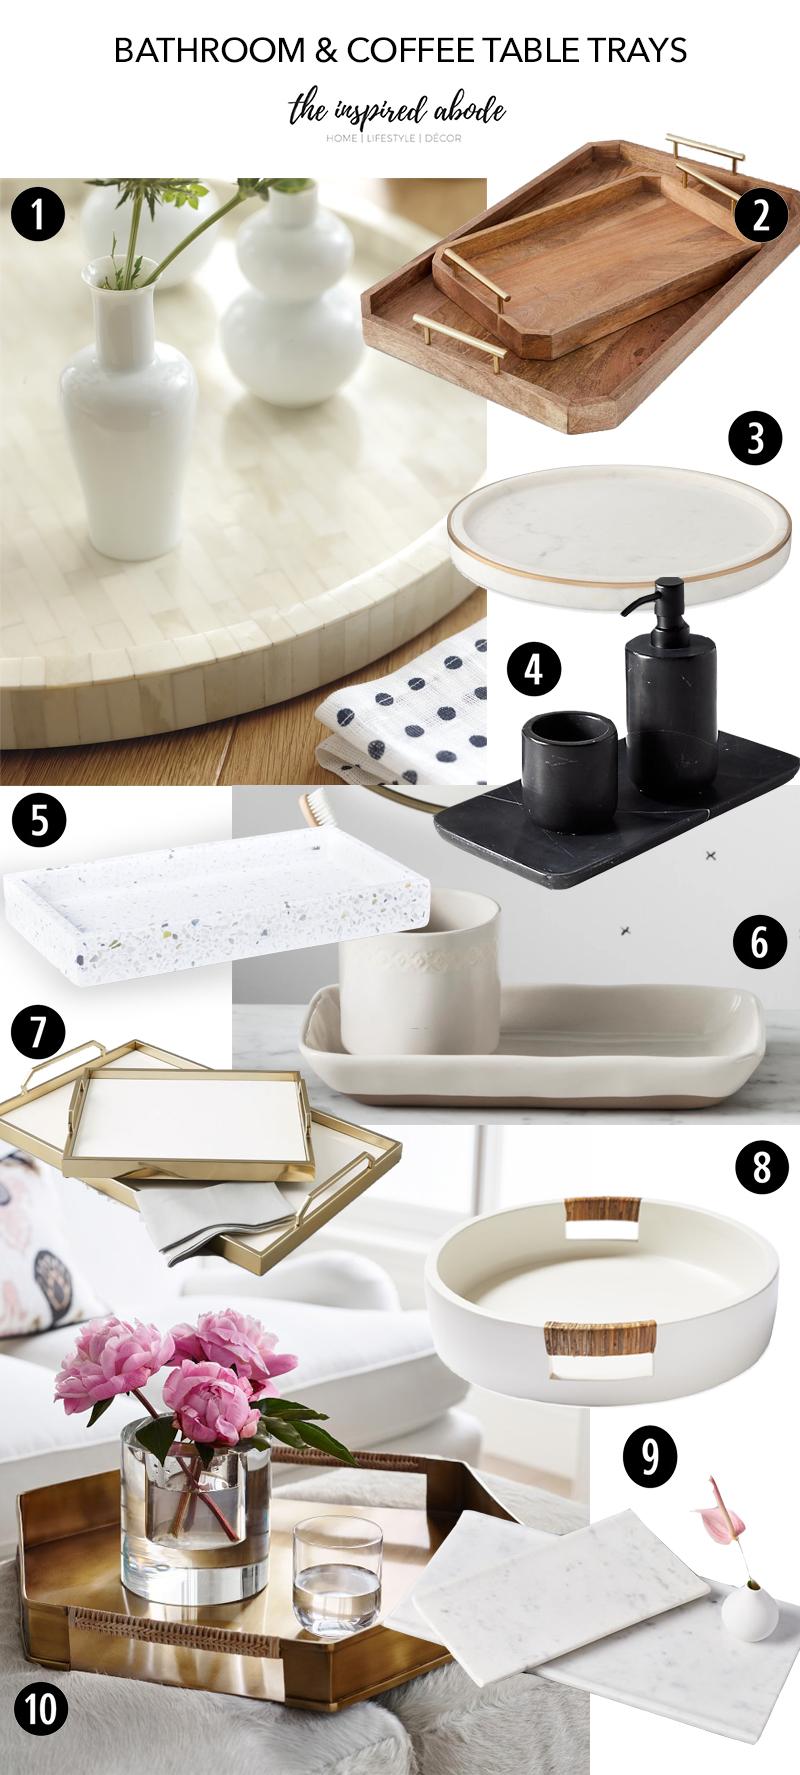 favorite bathroom coffee table trays